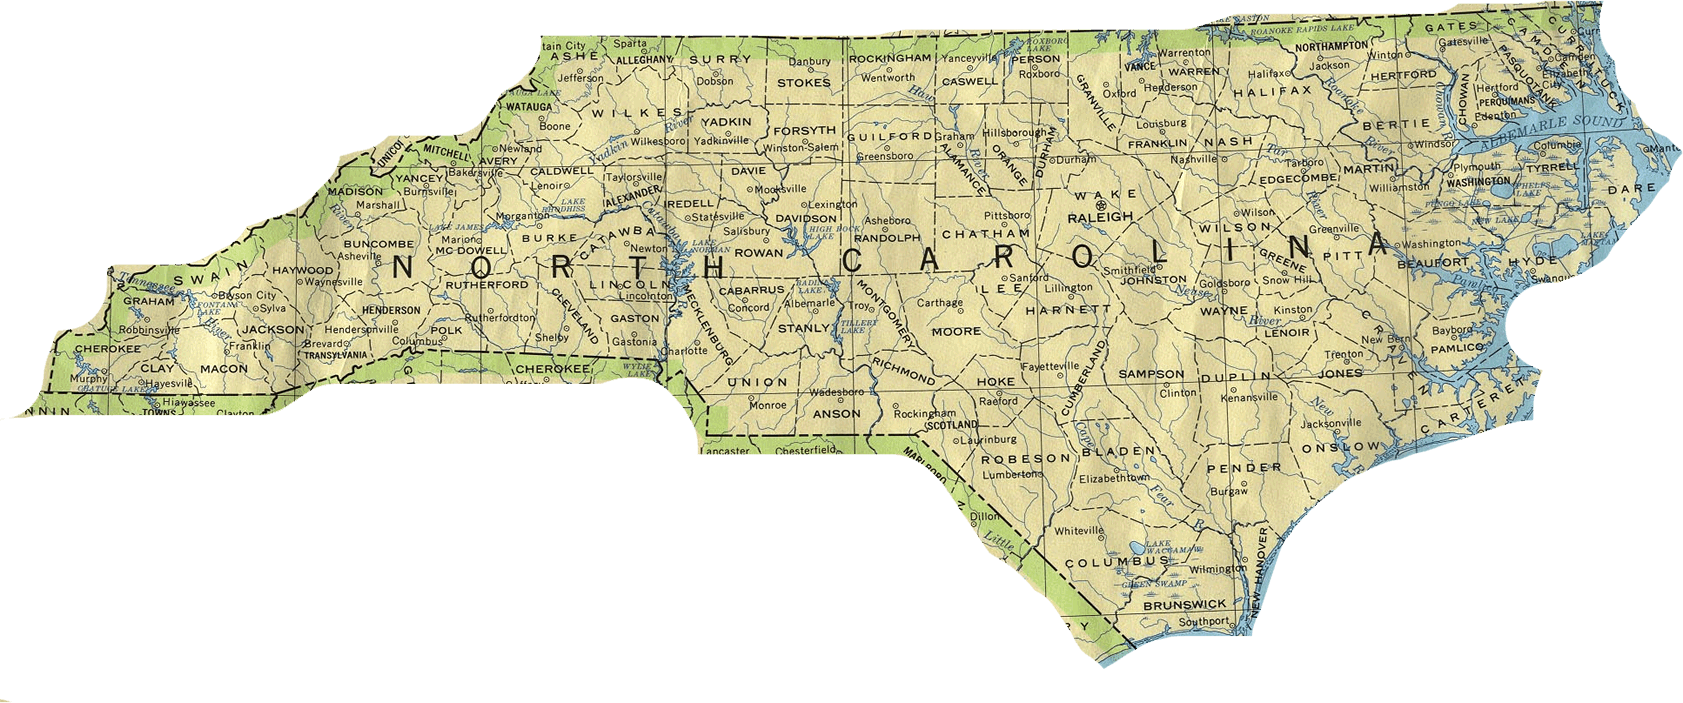 North Carolina State Map My Blog - State map north carolina